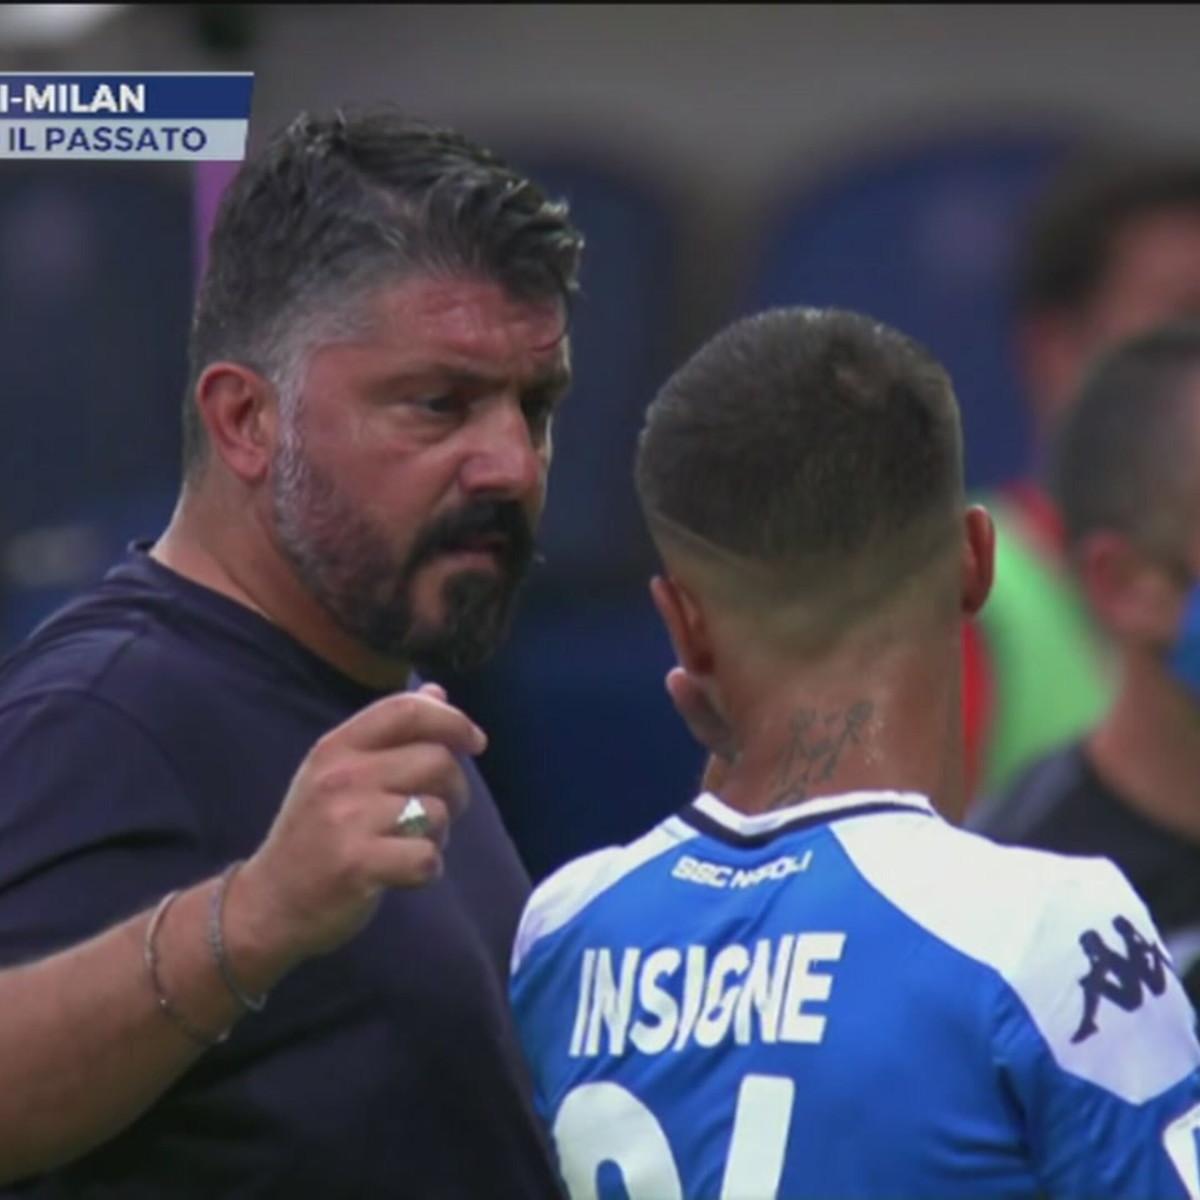 Napoli-Milan: Gattuso contro il passato